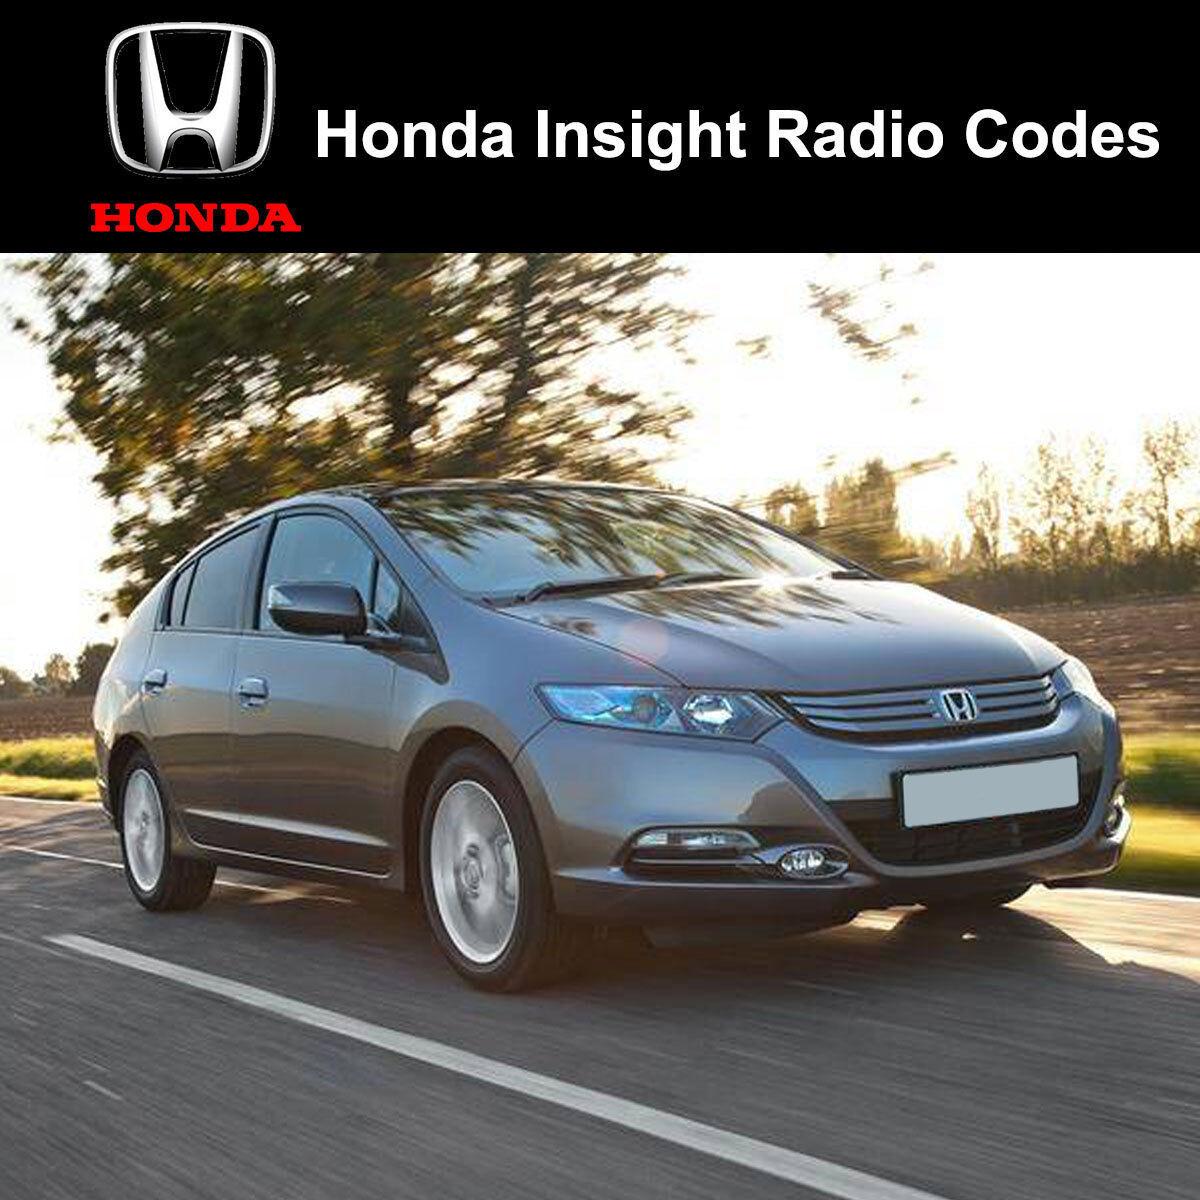 Honda Insight Radio Code Stereo Codes Fast Unlock Service Uk Ebay